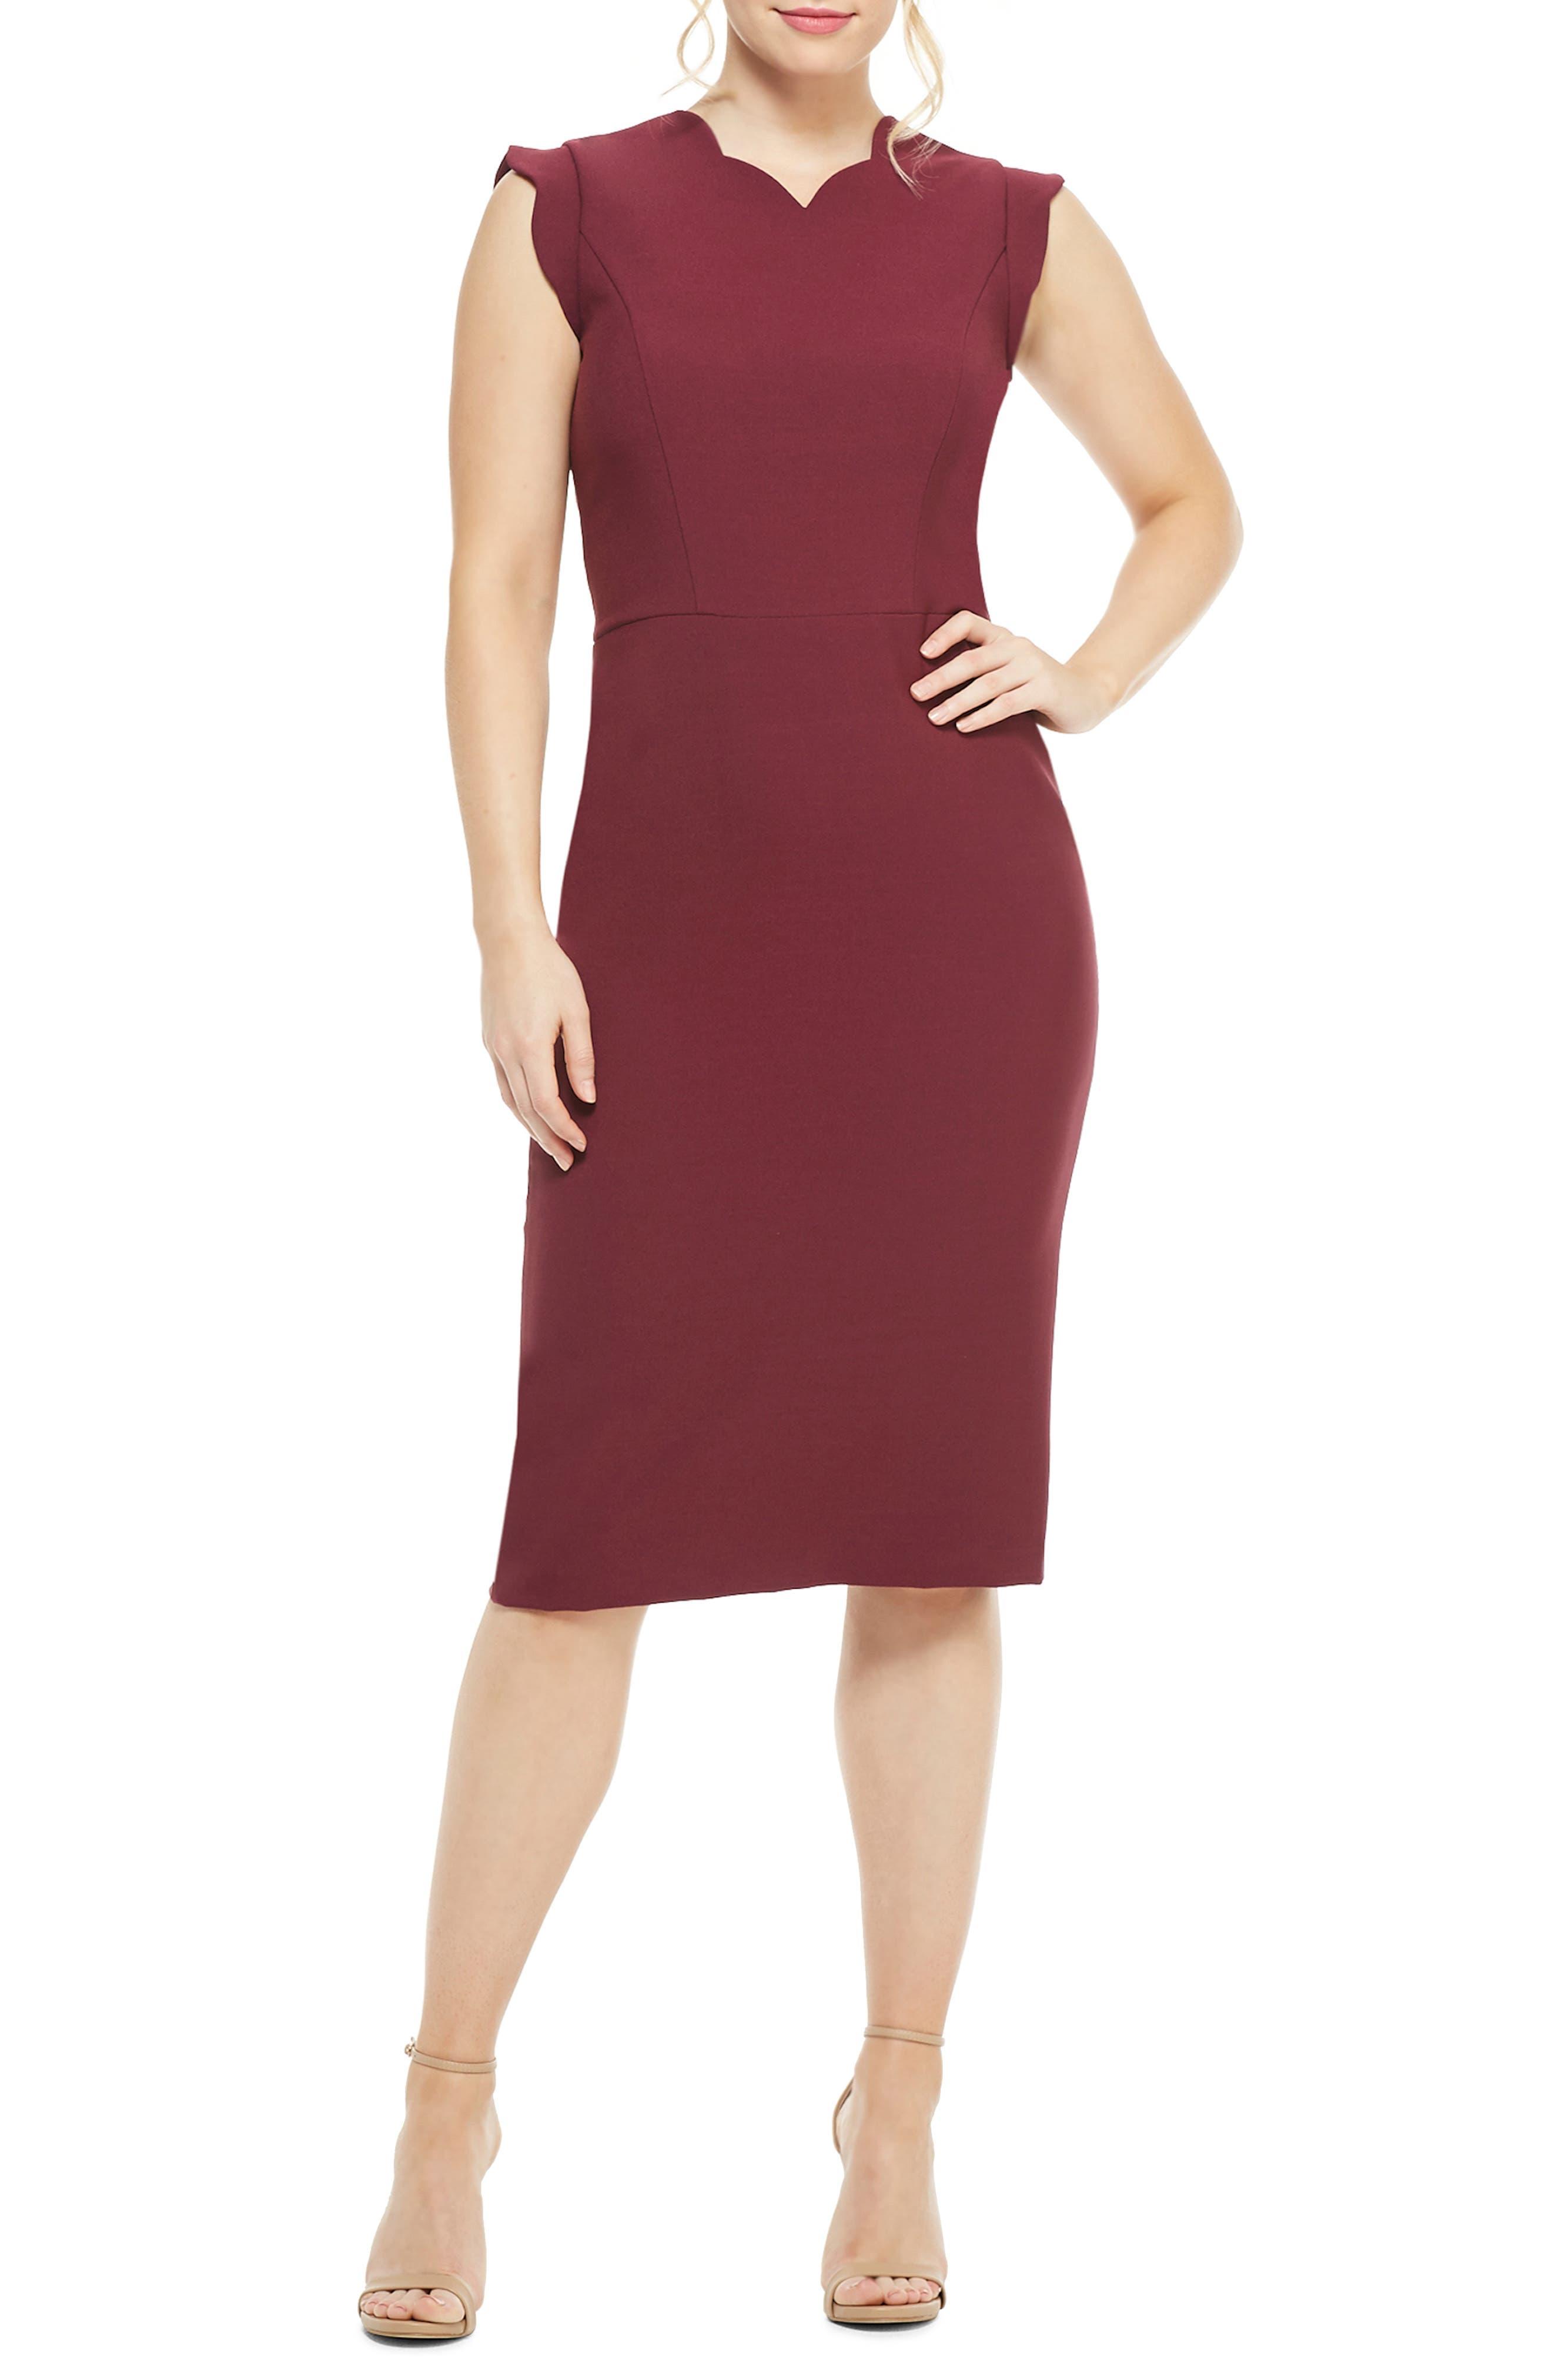 Maggy London Lucy Scallop Cap Sleeve Sheath Dress, Burgundy